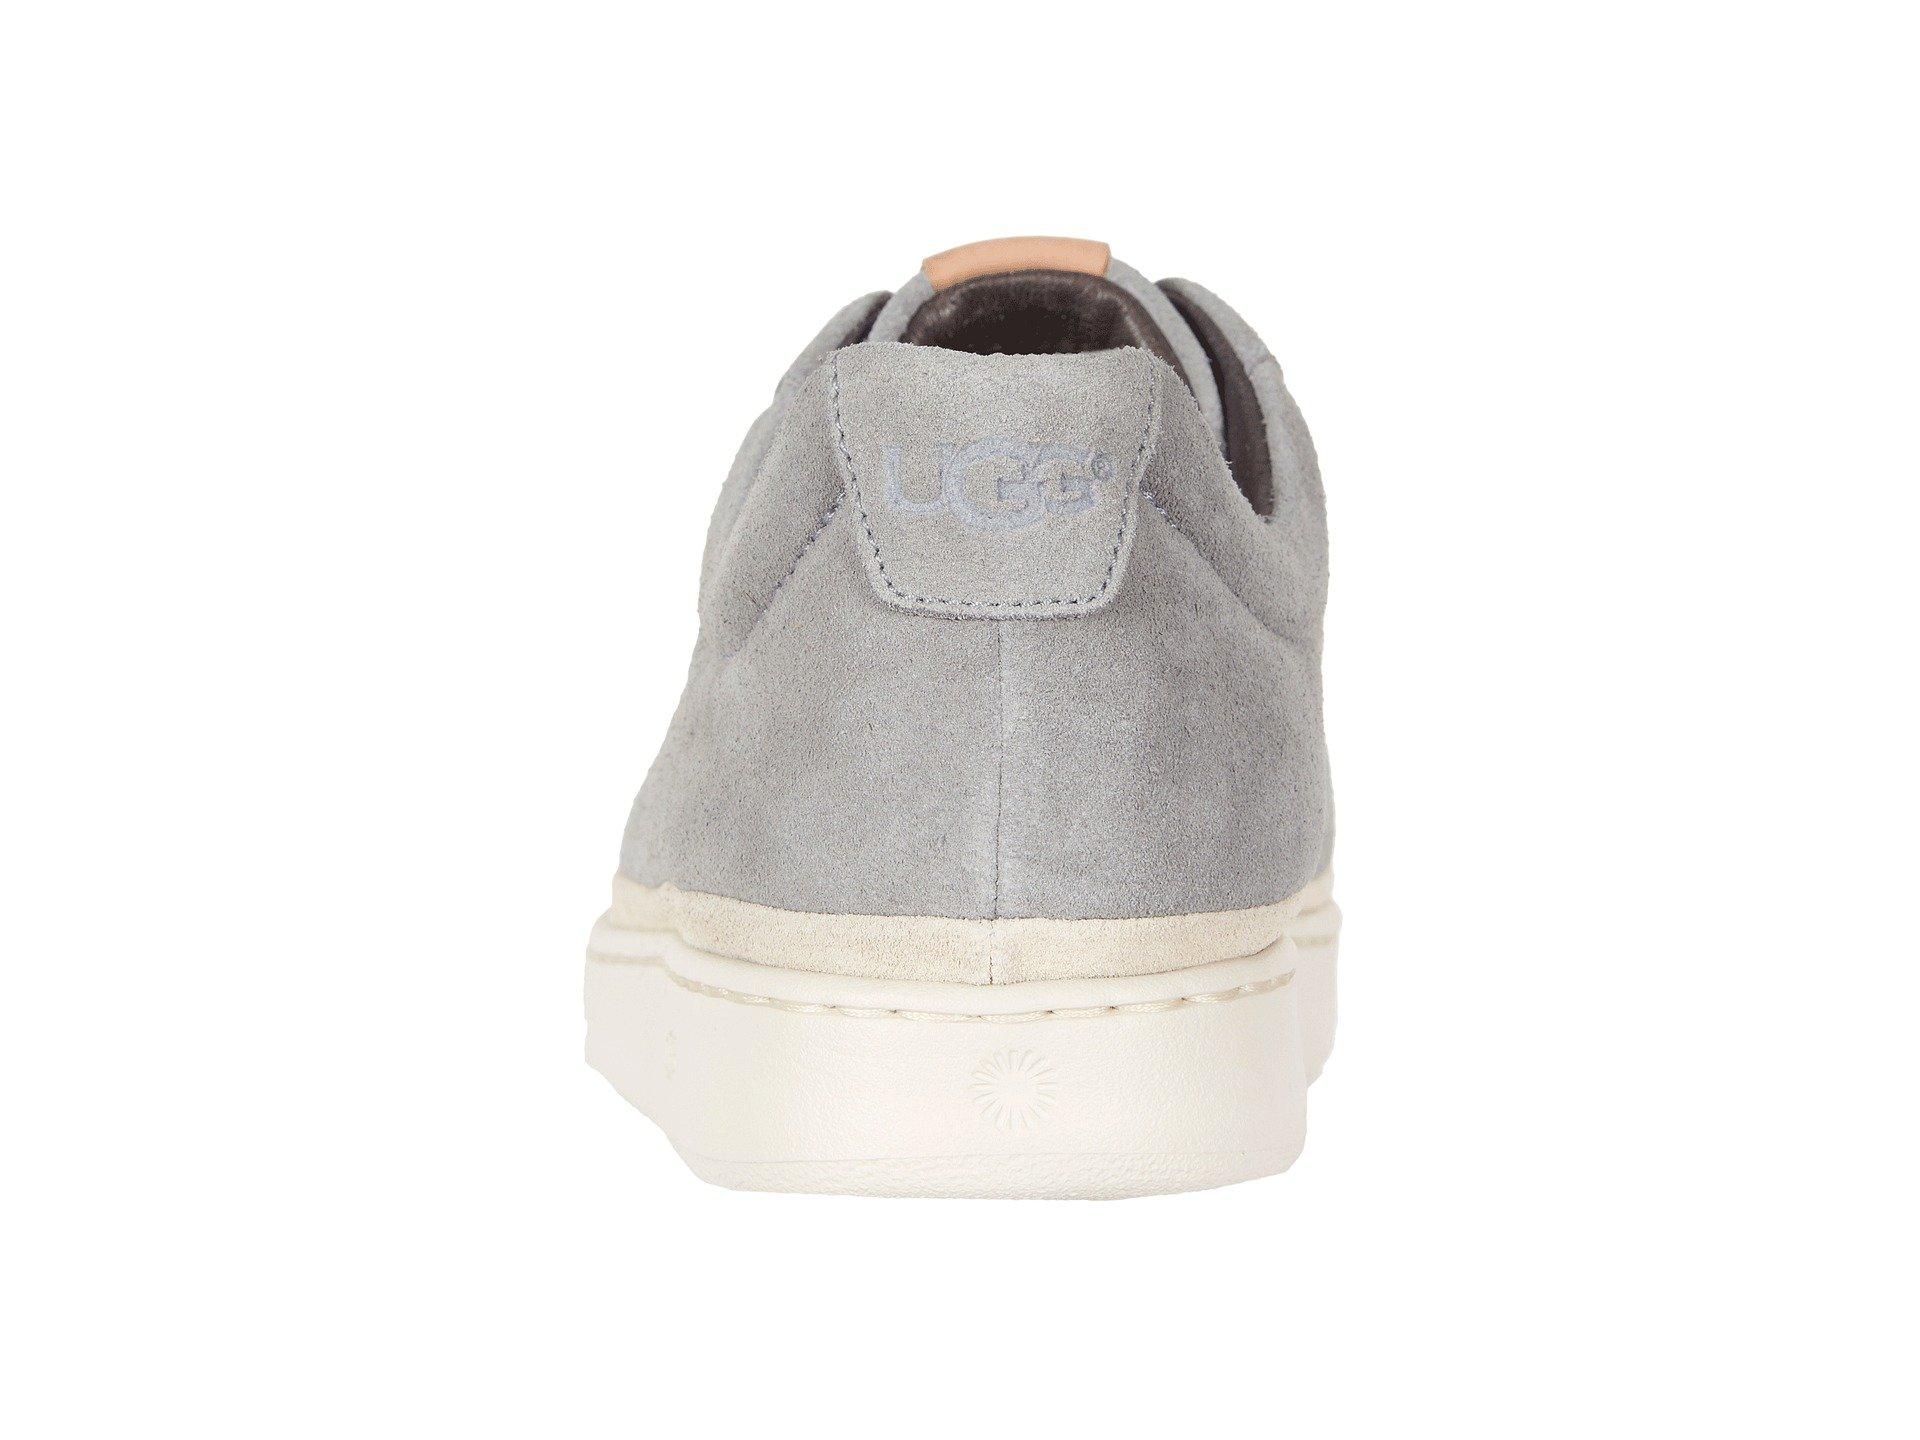 Cali Ugg Sneaker Low Cali Sneaker Seal Ugg trrvq